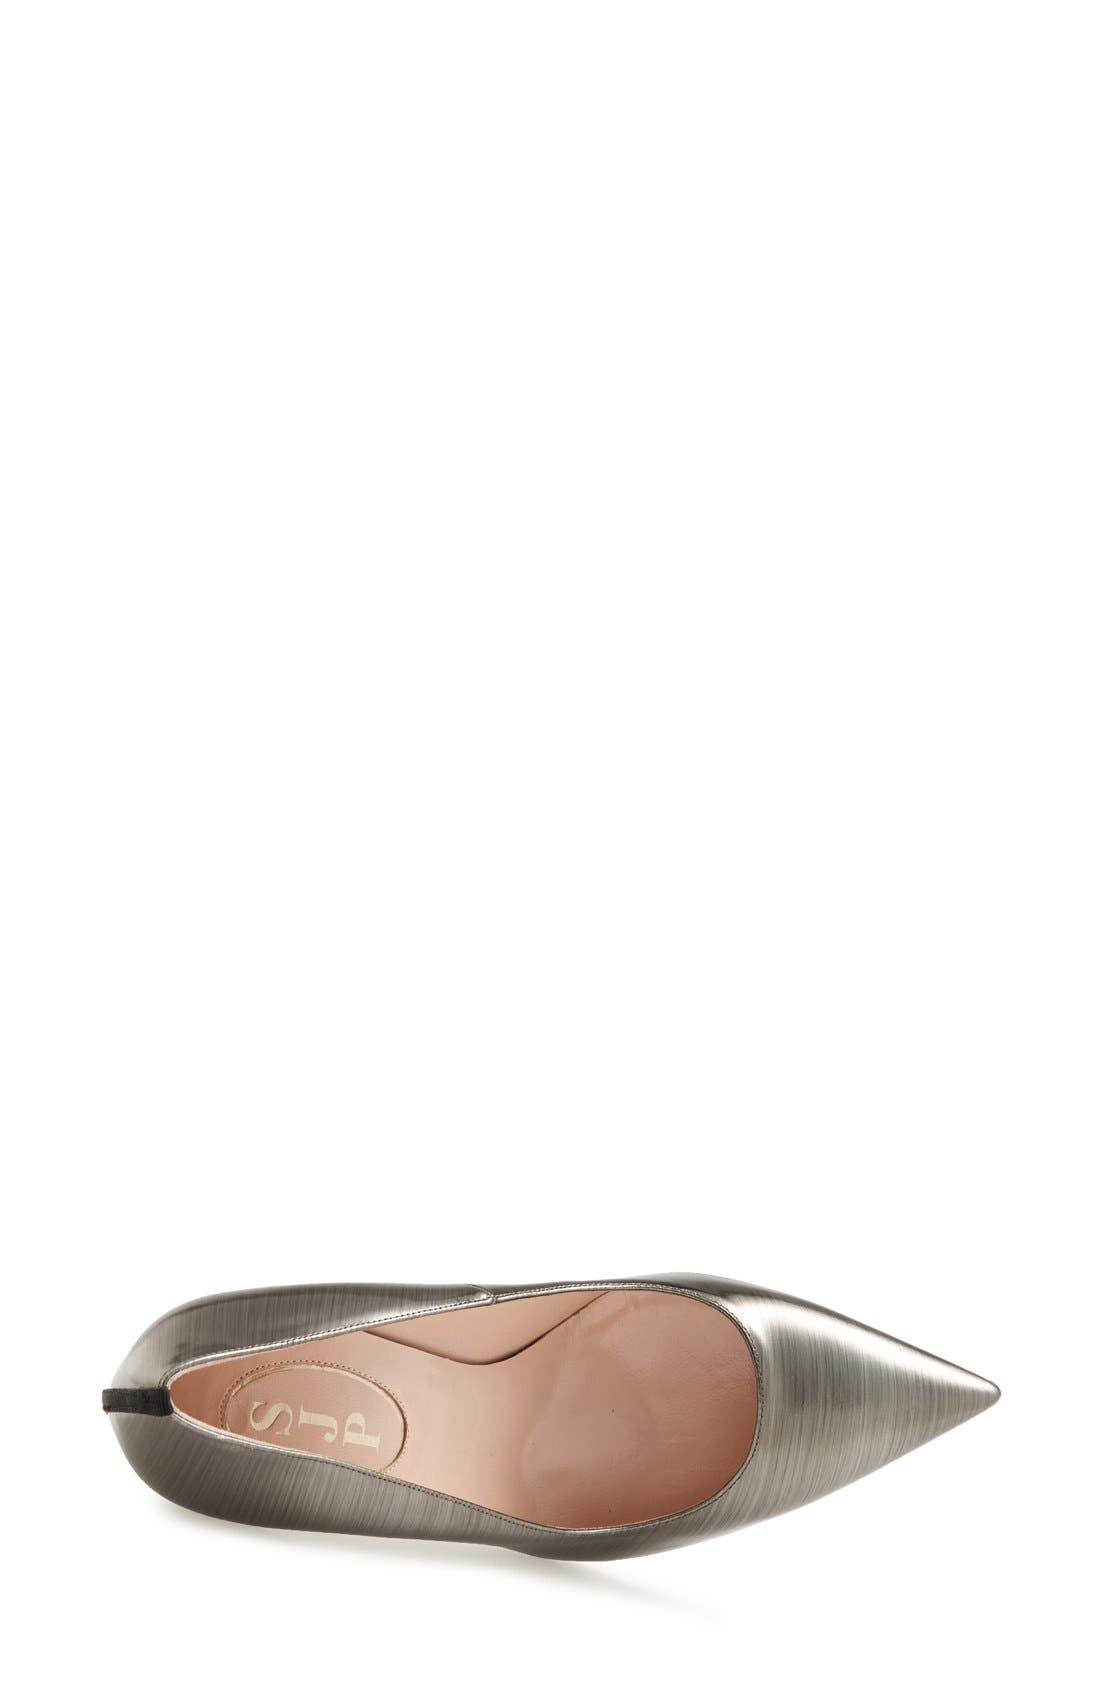 Alternate Image 3  - SJP by Sarah Jessica Parker 'Fawn' Specchio Leather Pump (Women)